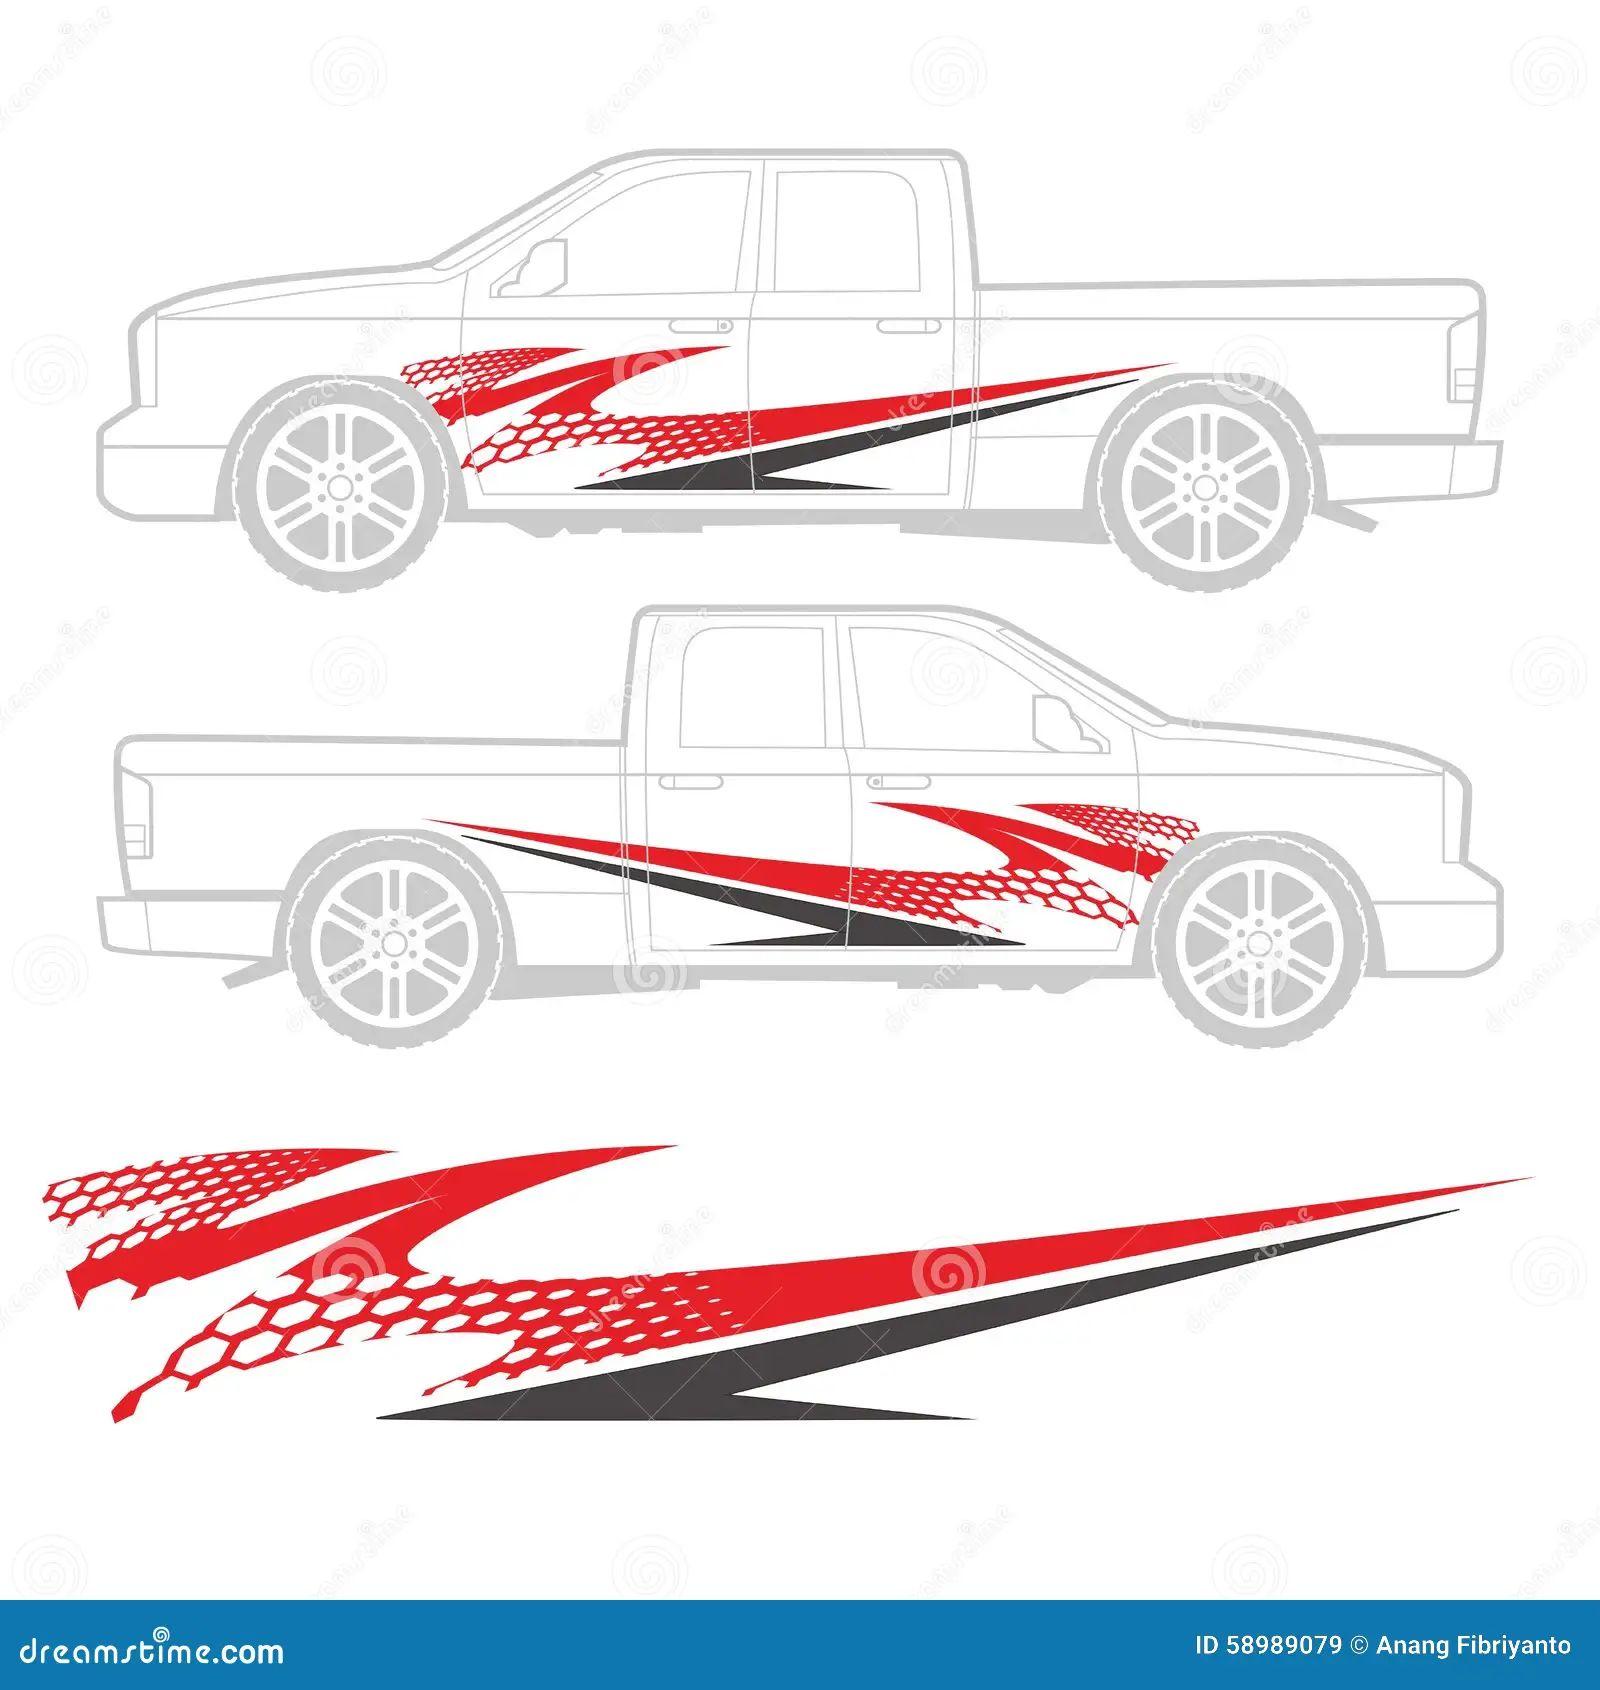 Car sticker design download -  Vehicle Decal Graphic Design Download